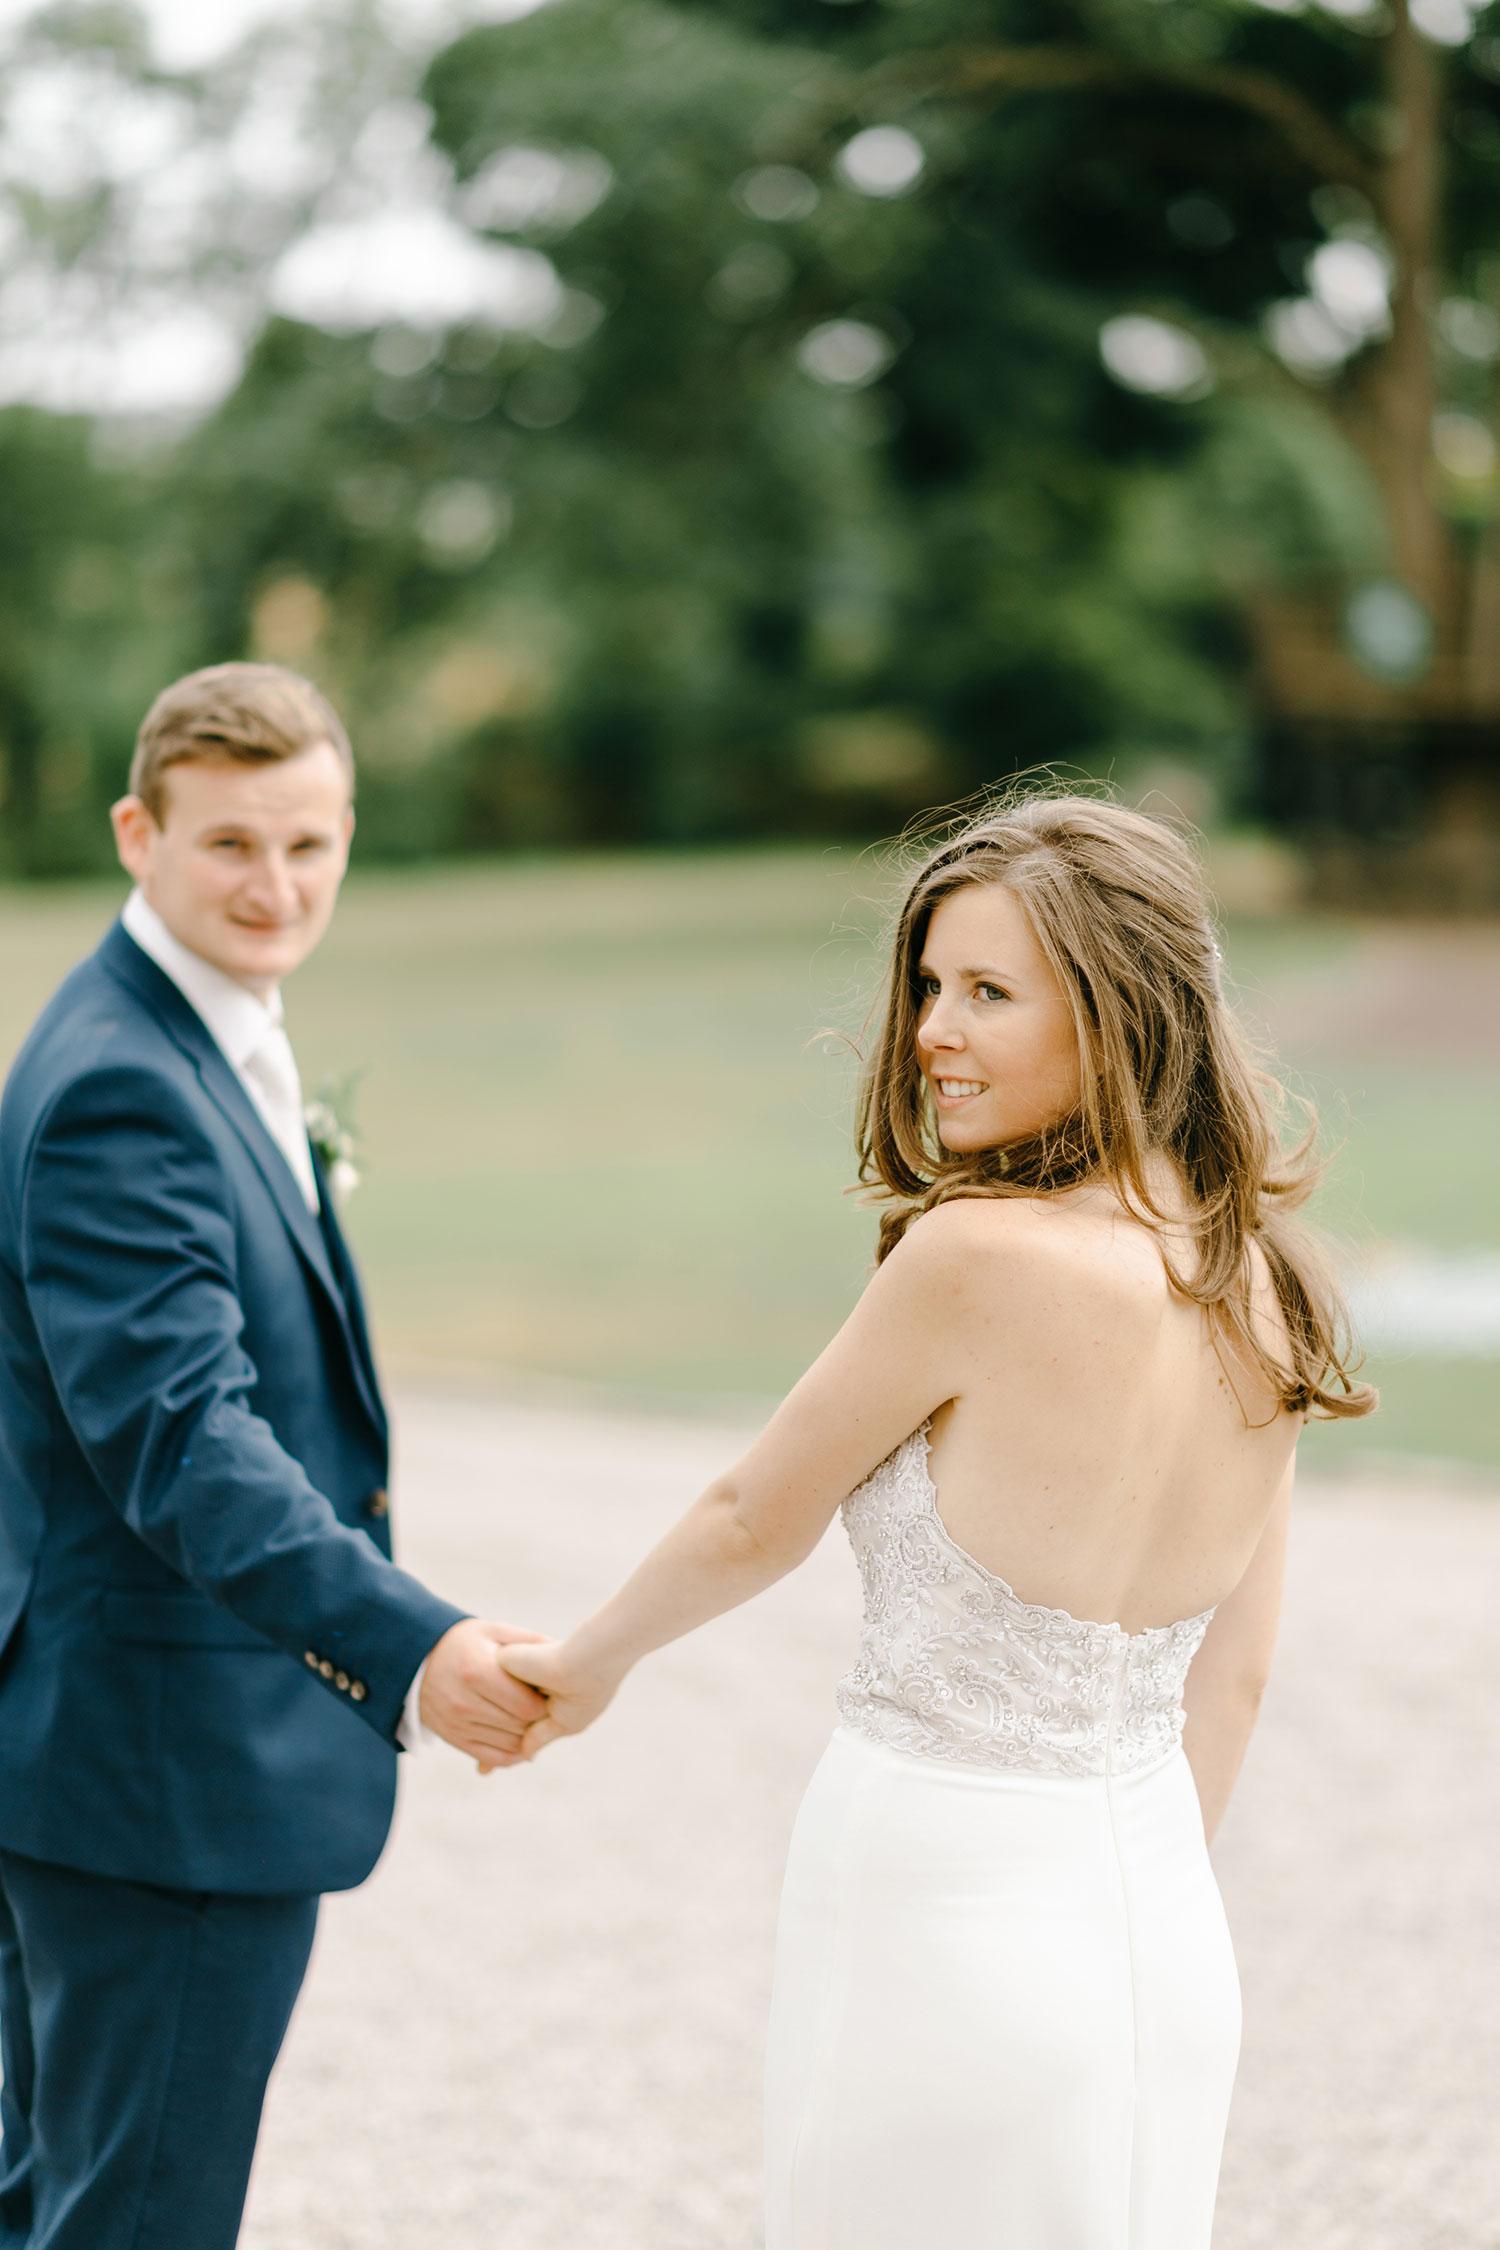 destination-wedding-photographer-ballinacurra-house-wedding-20180711_0088.jpg